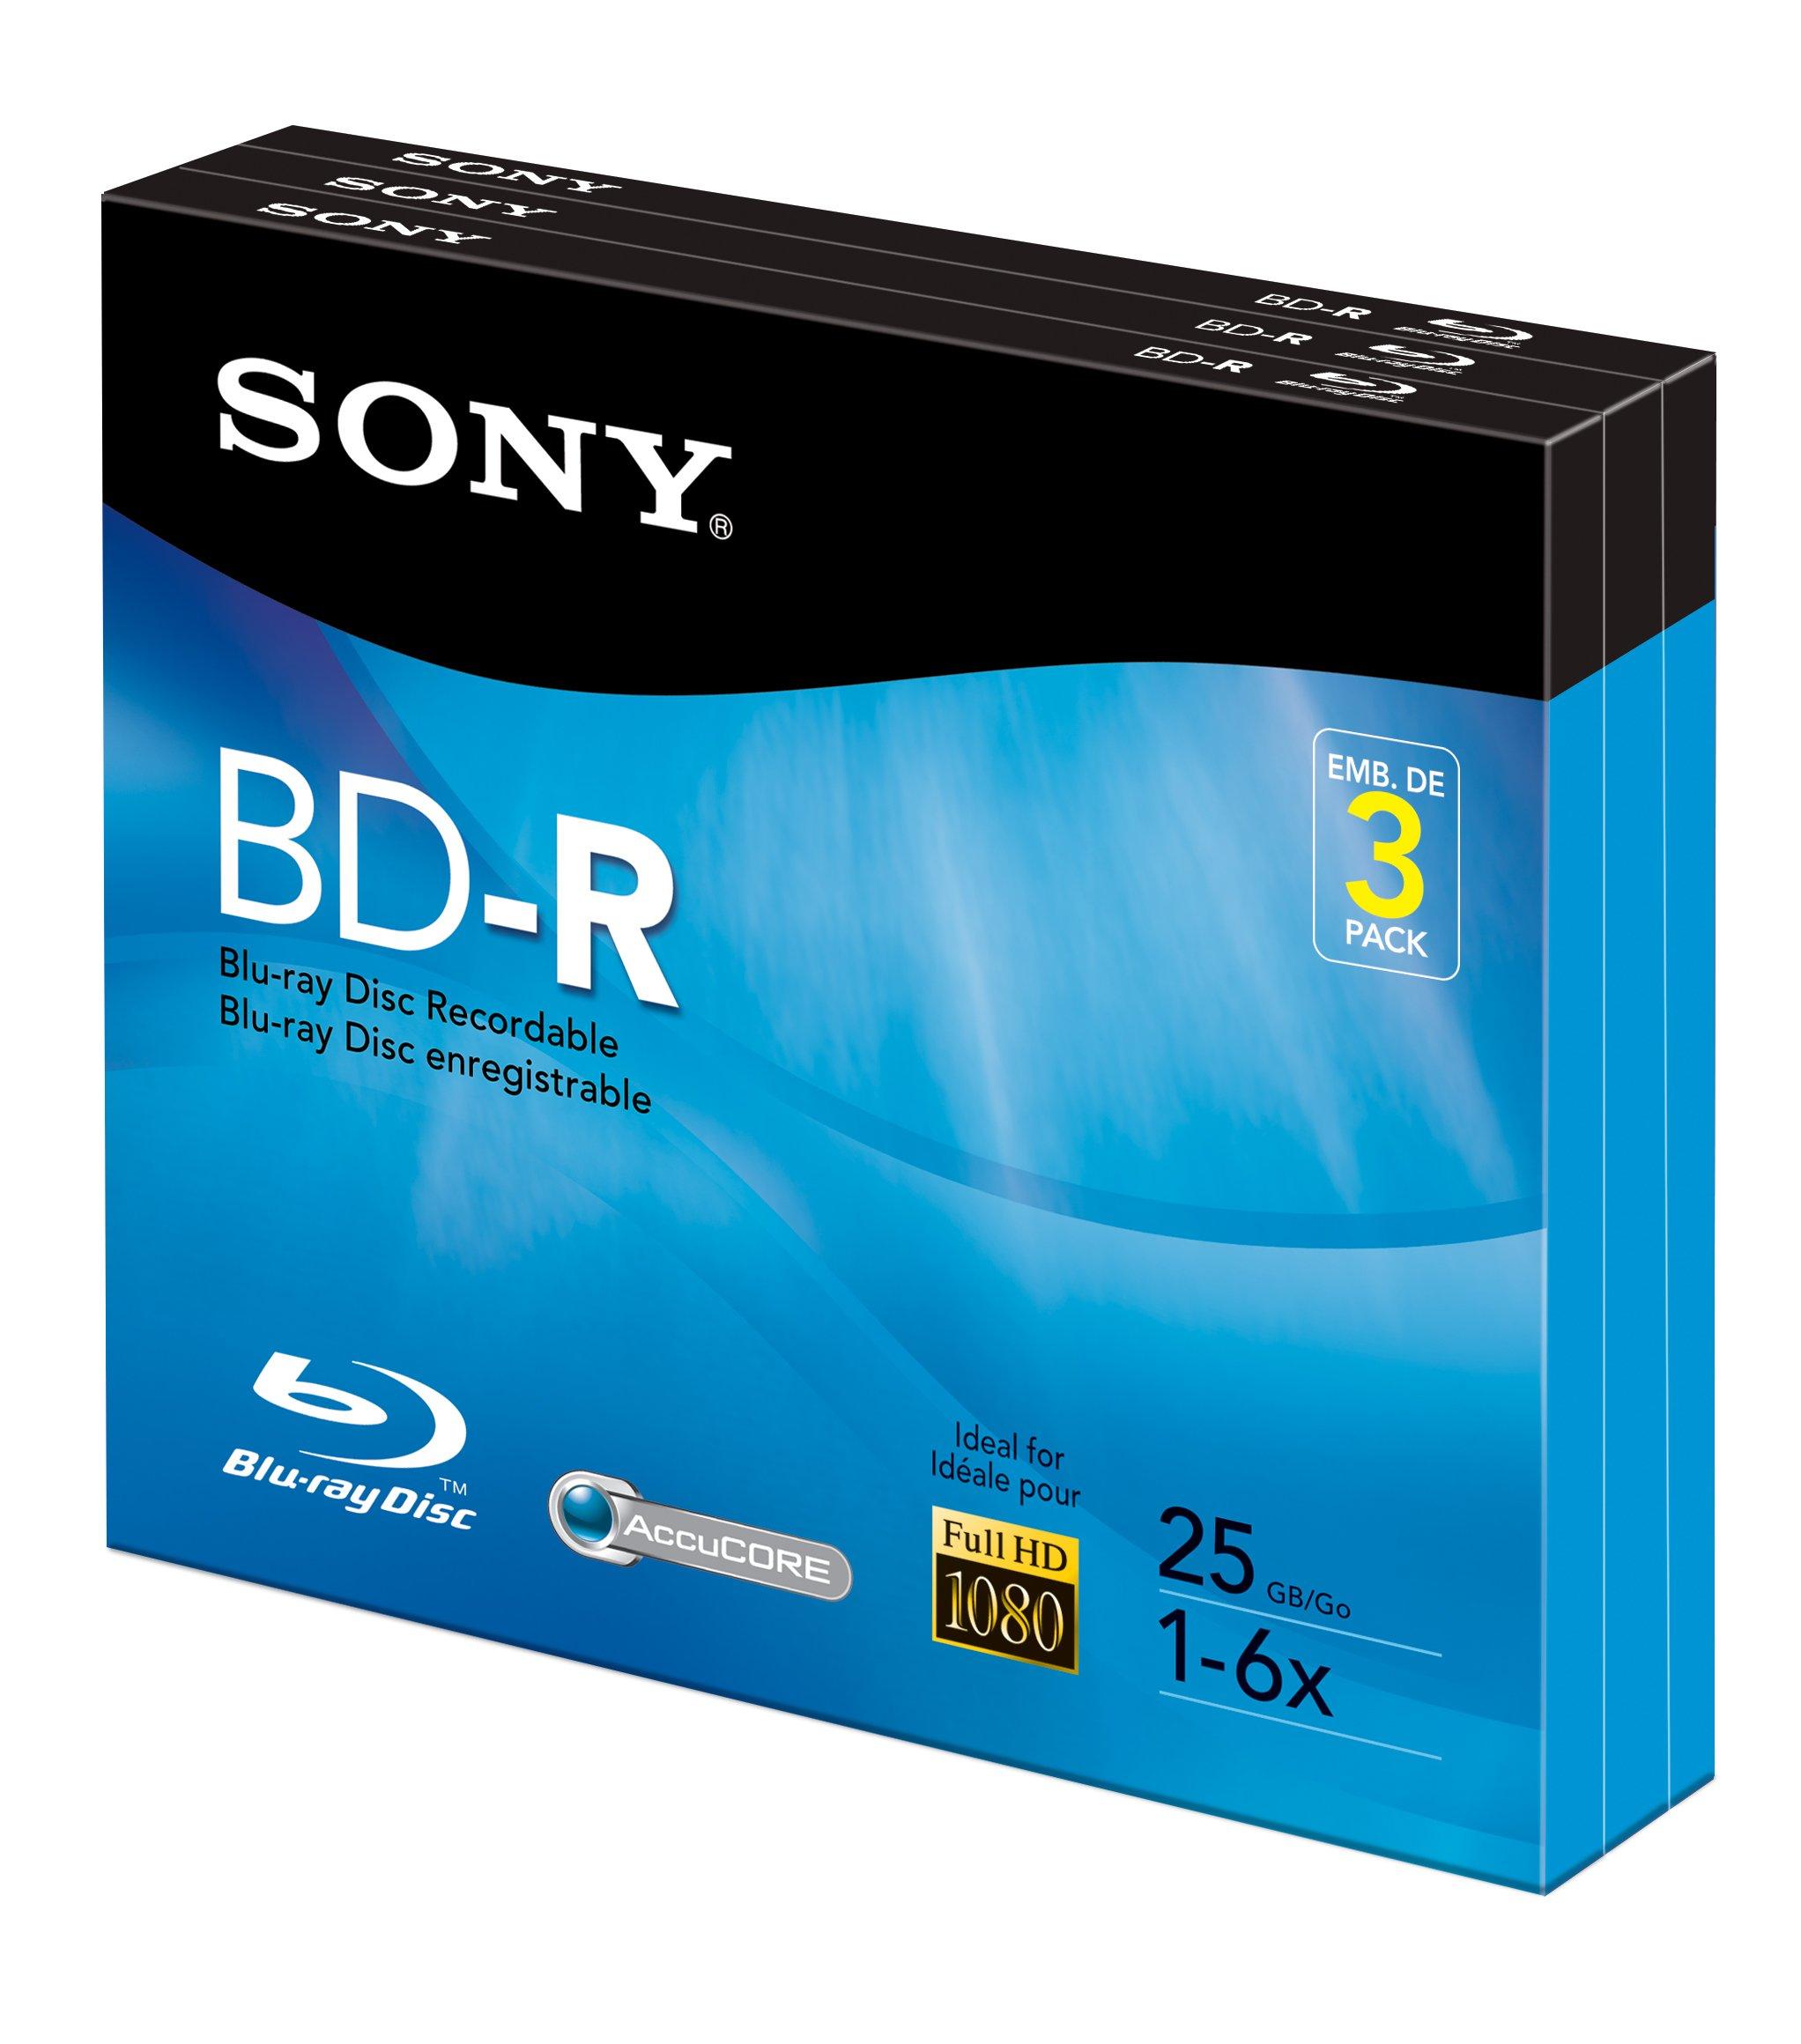 Sony 3BNR25R3H 6x 25GB Recordable Blu-Ray Disc - 3 Pack